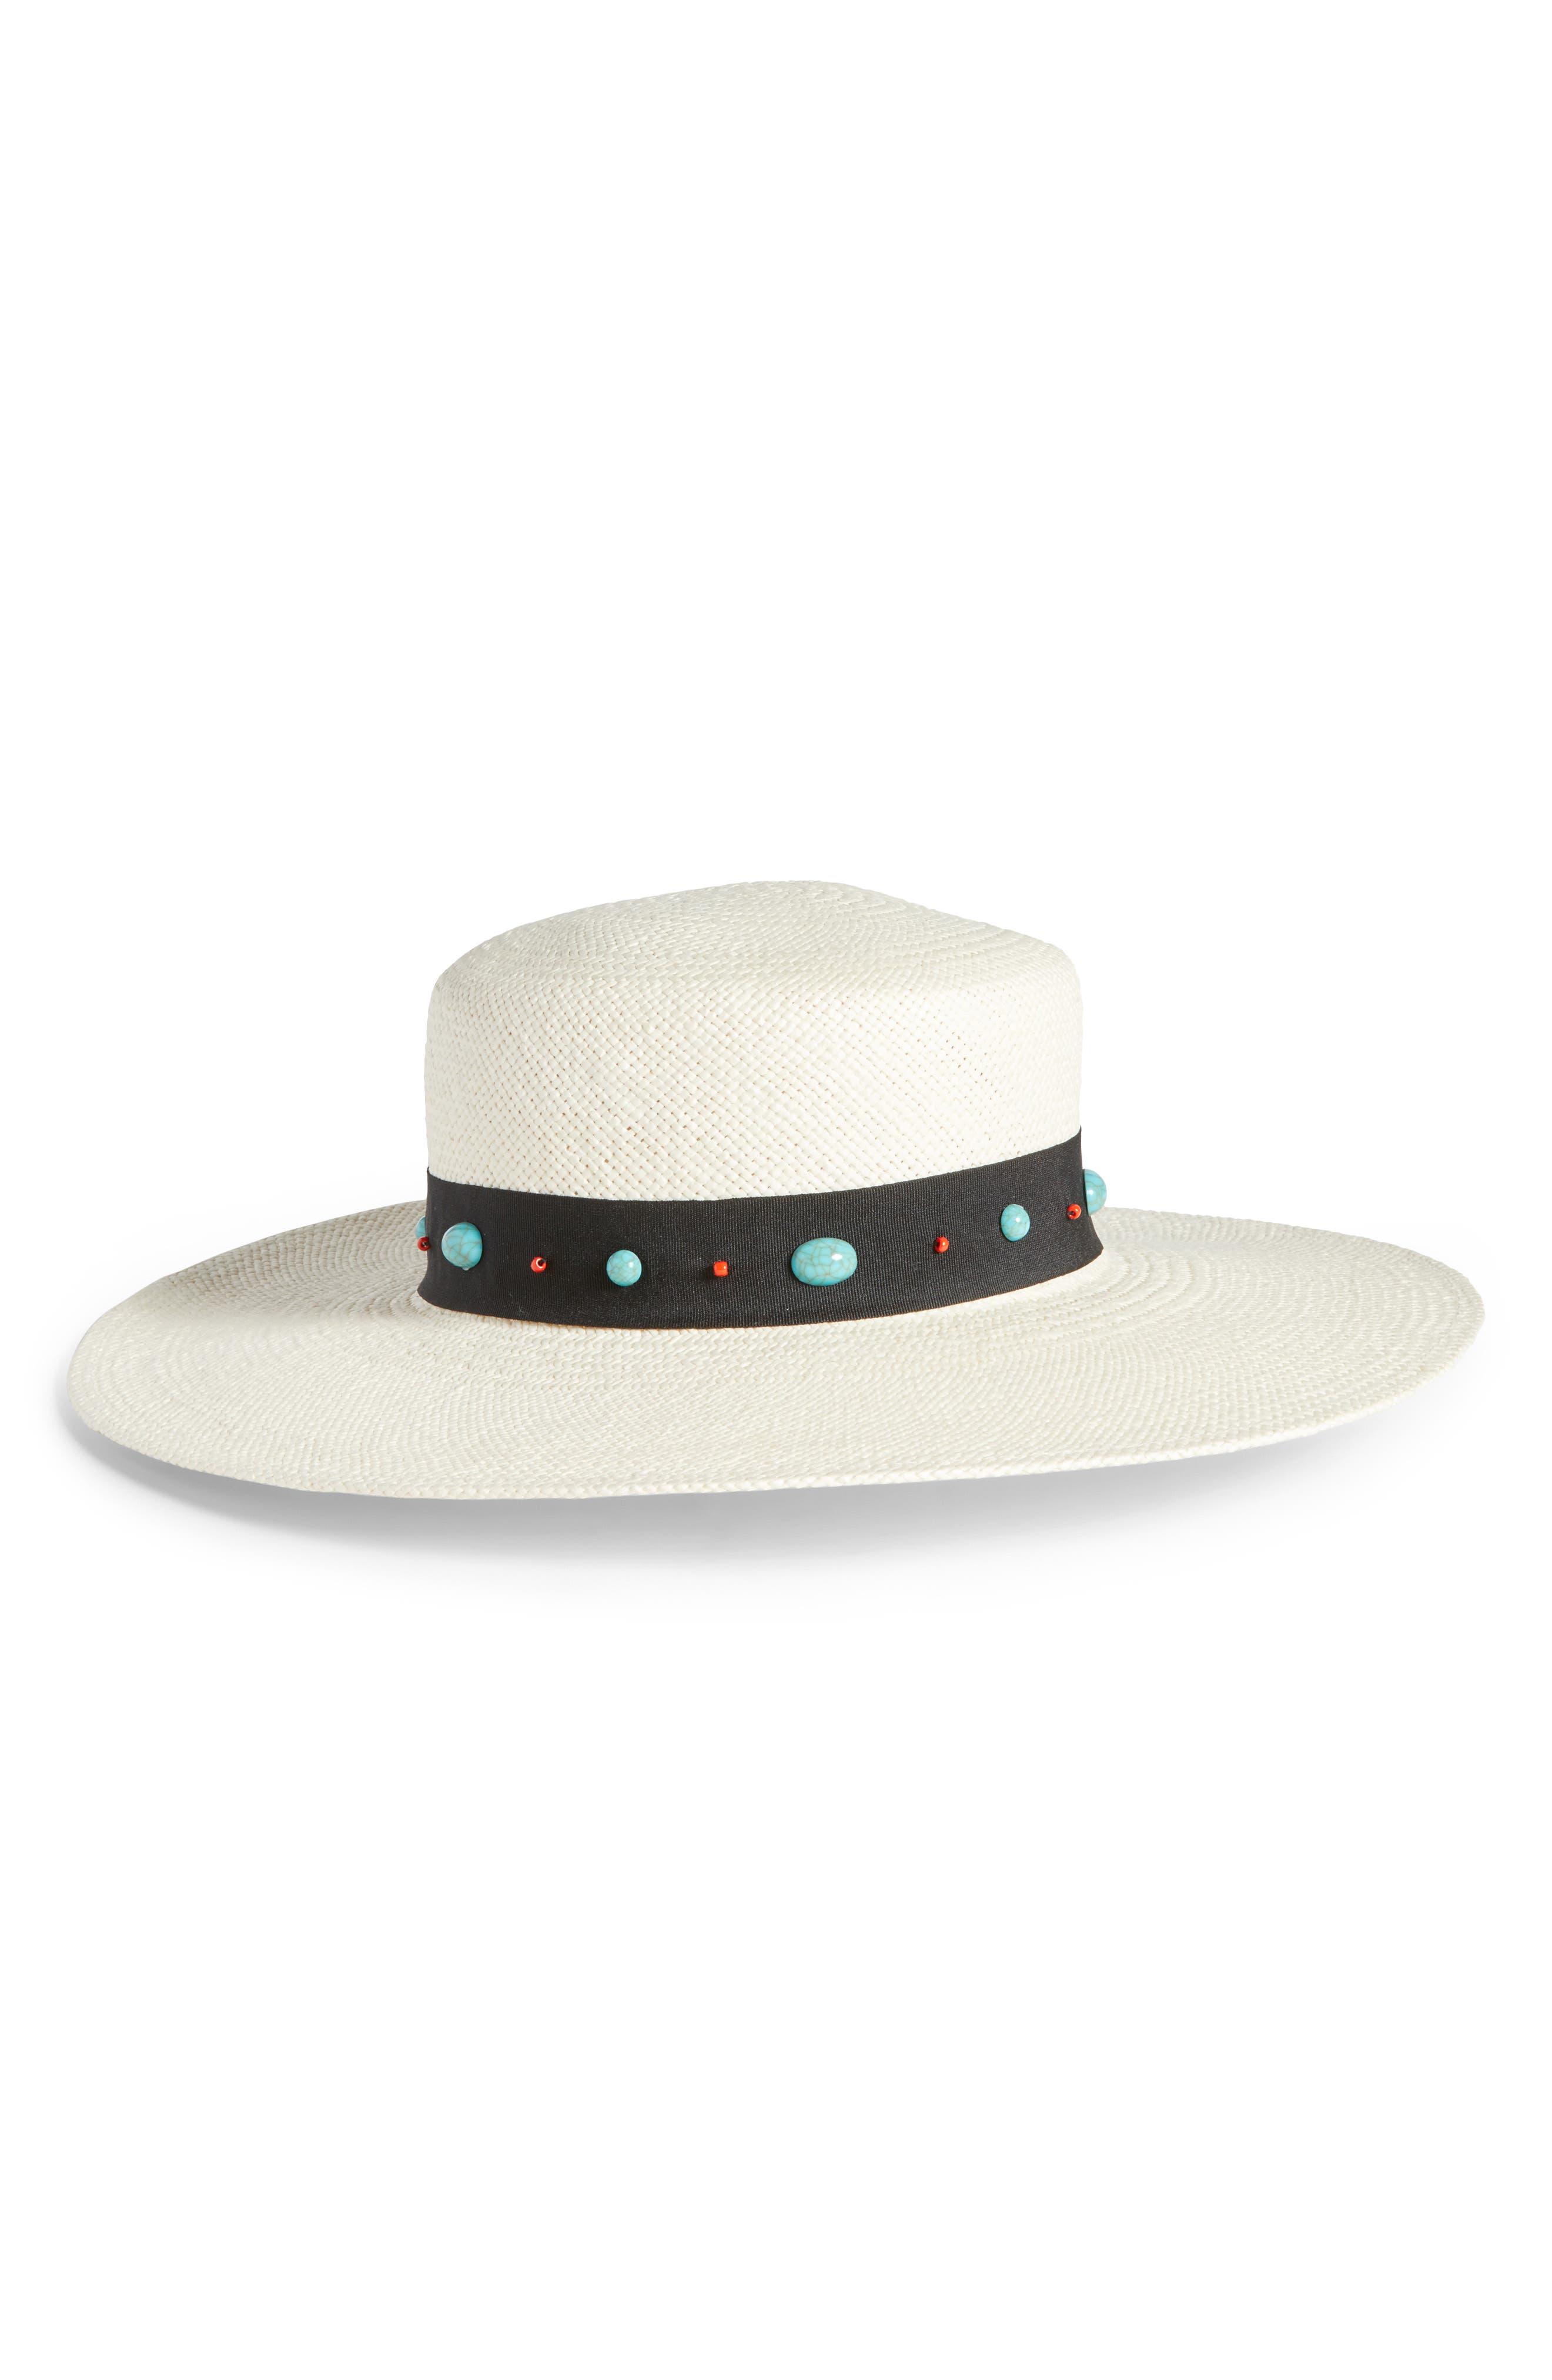 TREASURE & BOND,                             Western Straw Boater Hat,                             Main thumbnail 1, color,                             900